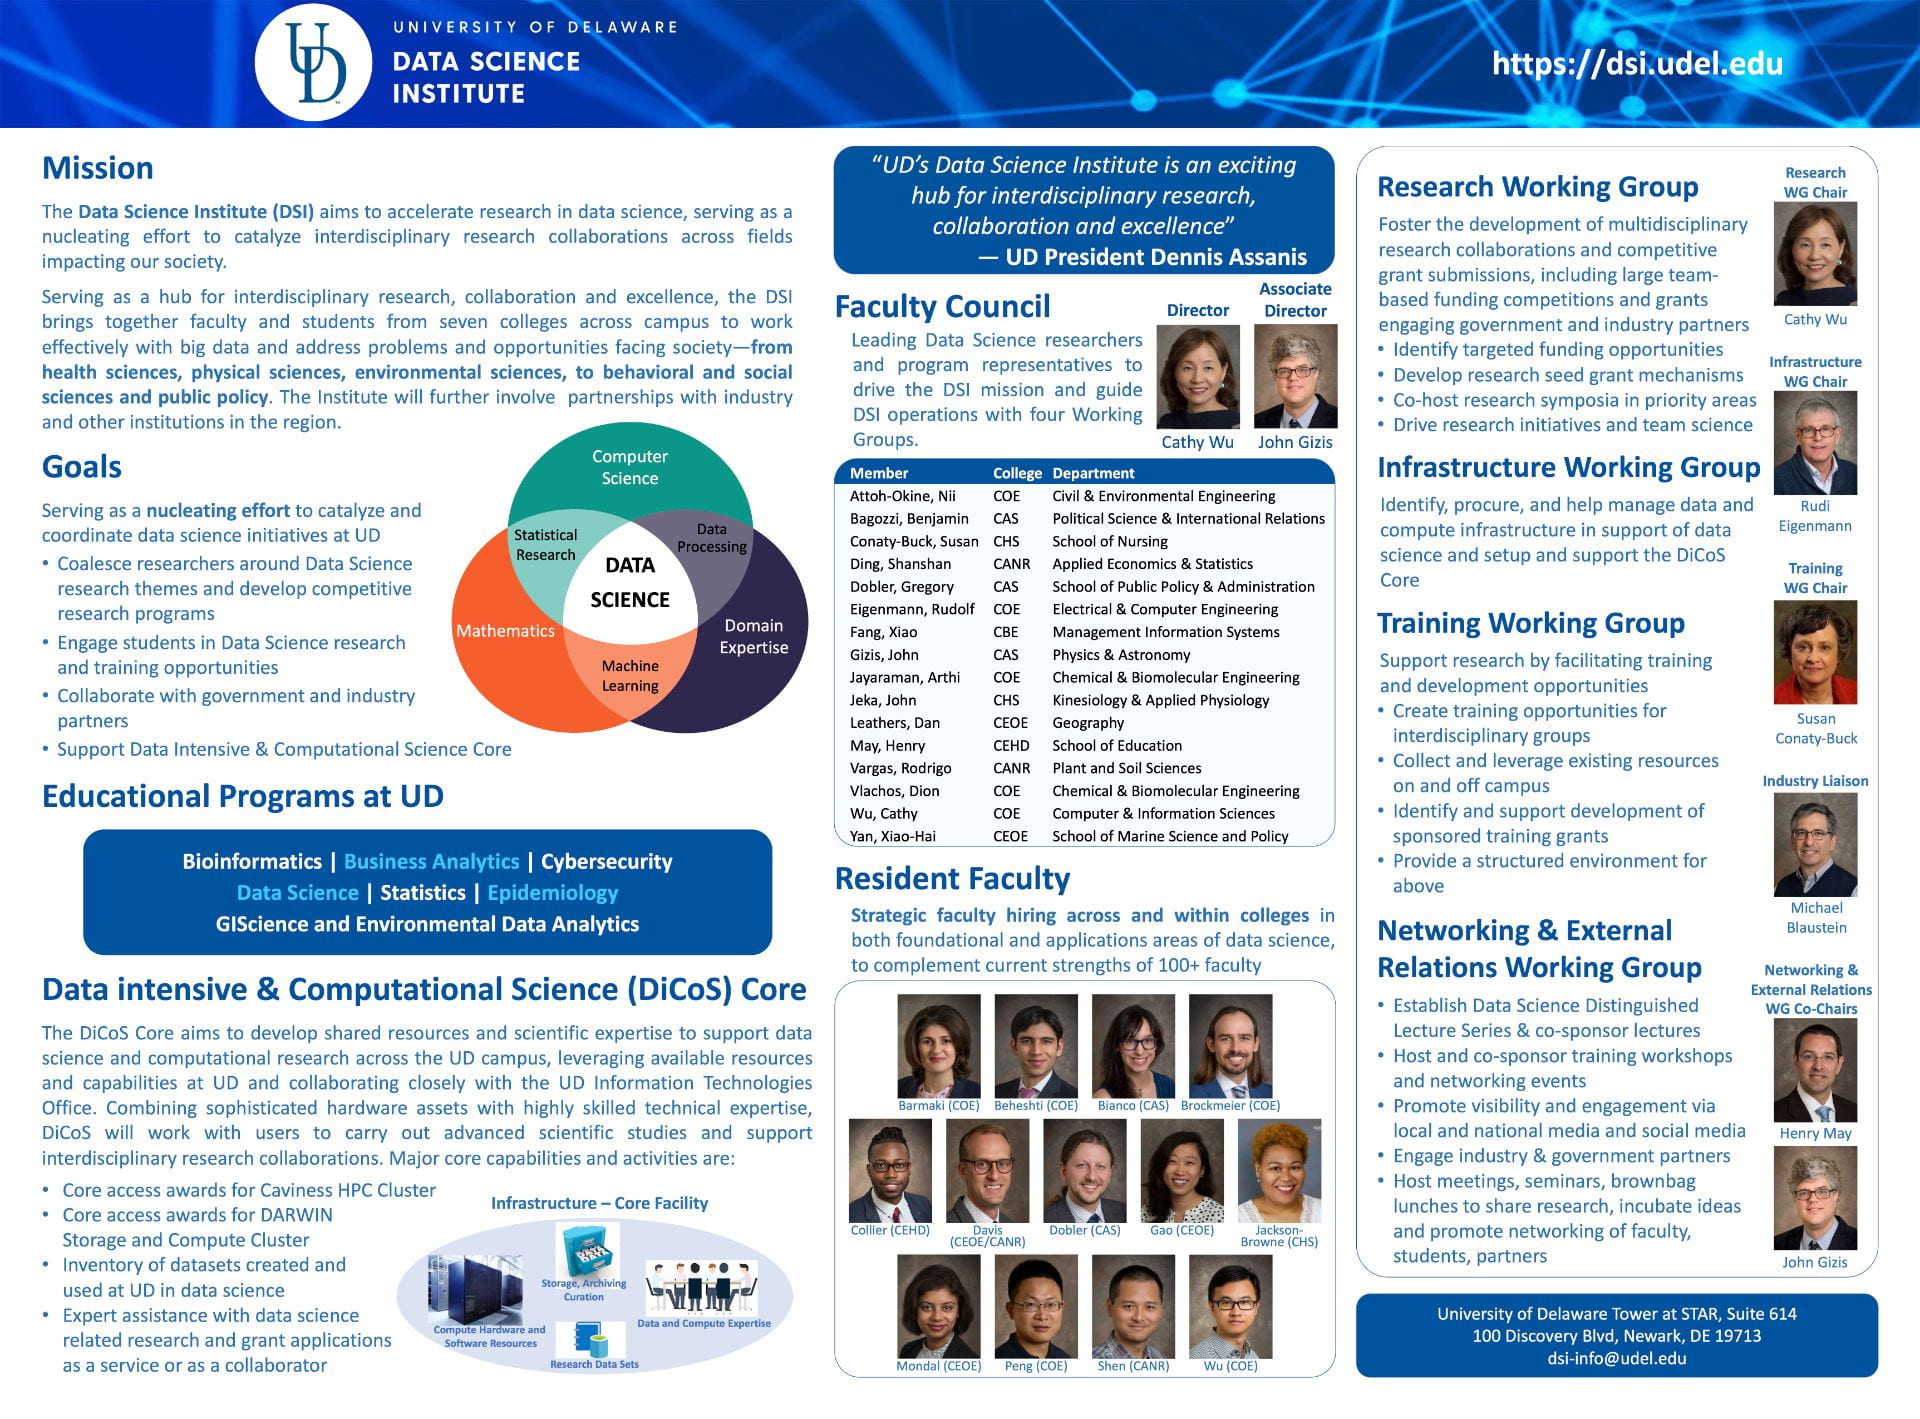 DSI Poster_2021.03.03_compressed